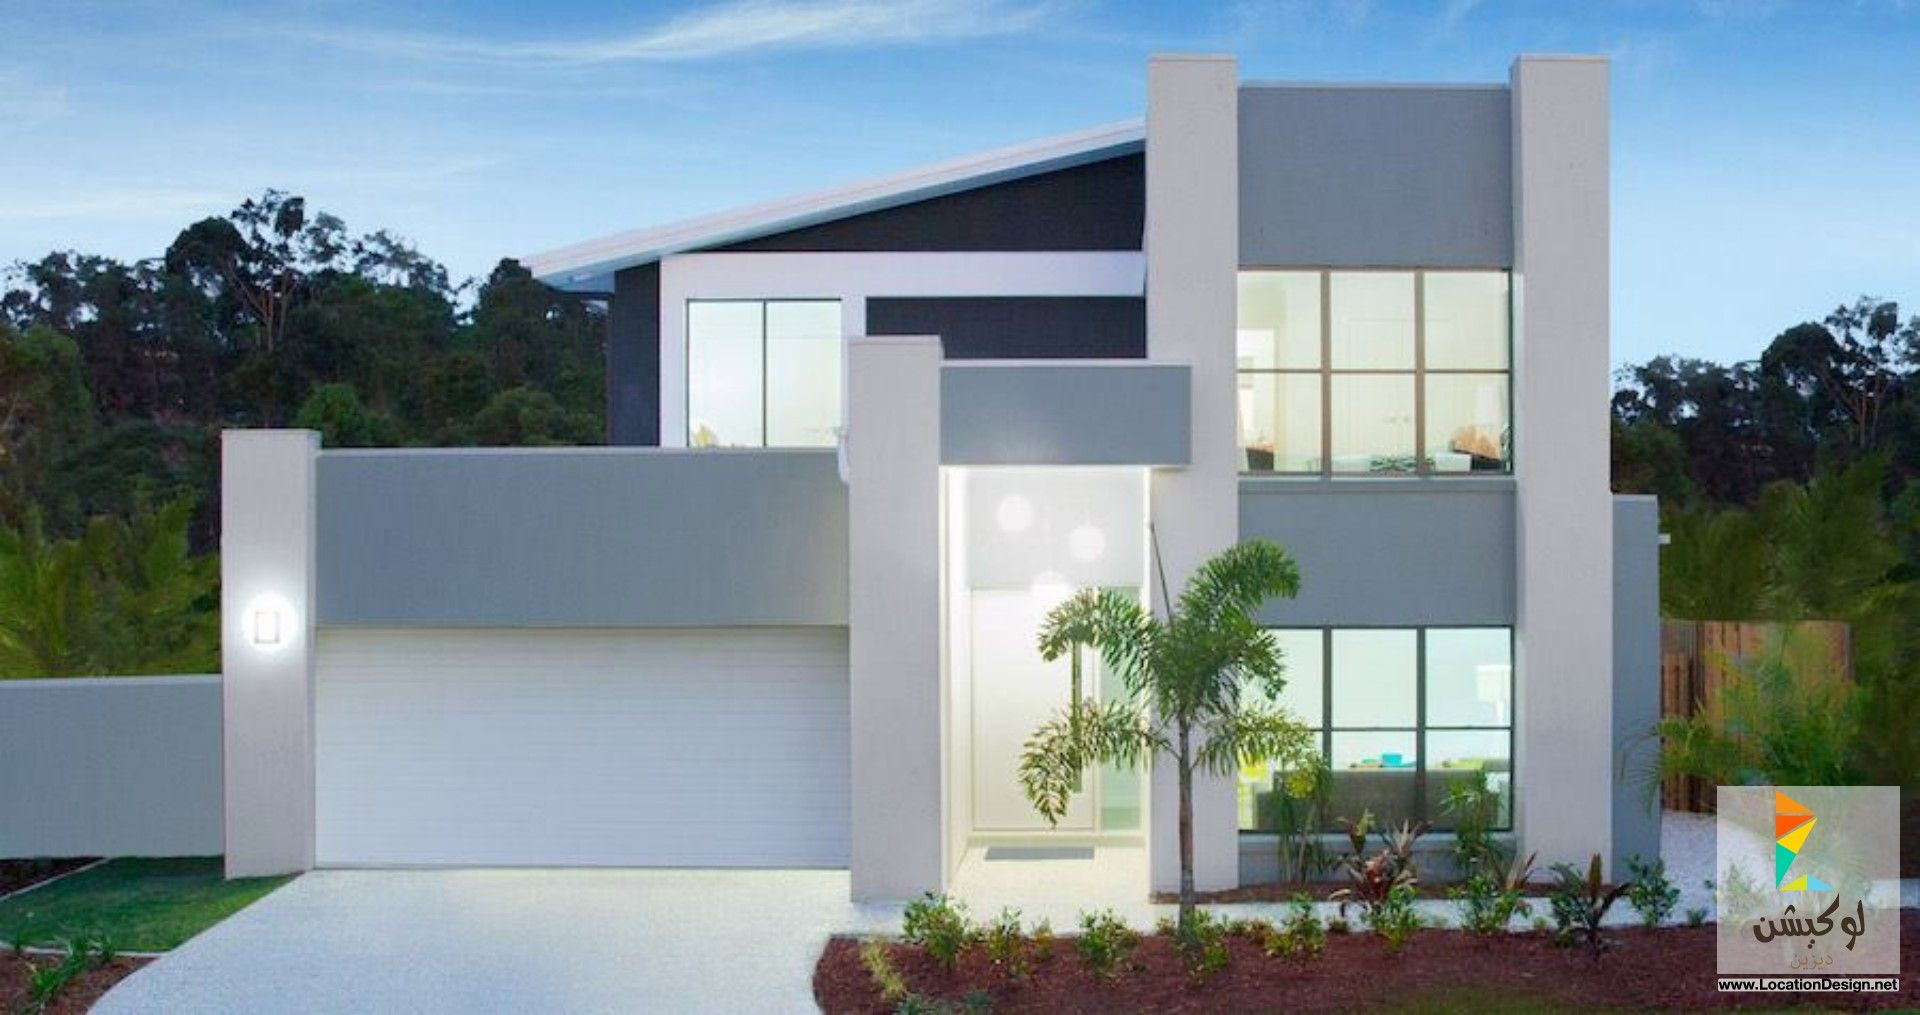 تصميم واجهات منازل مودرن لوكيشن ديزاين تصميمات ديكورات أفكار جديدة مصر Locationdesign Com House Modern Family House House Design